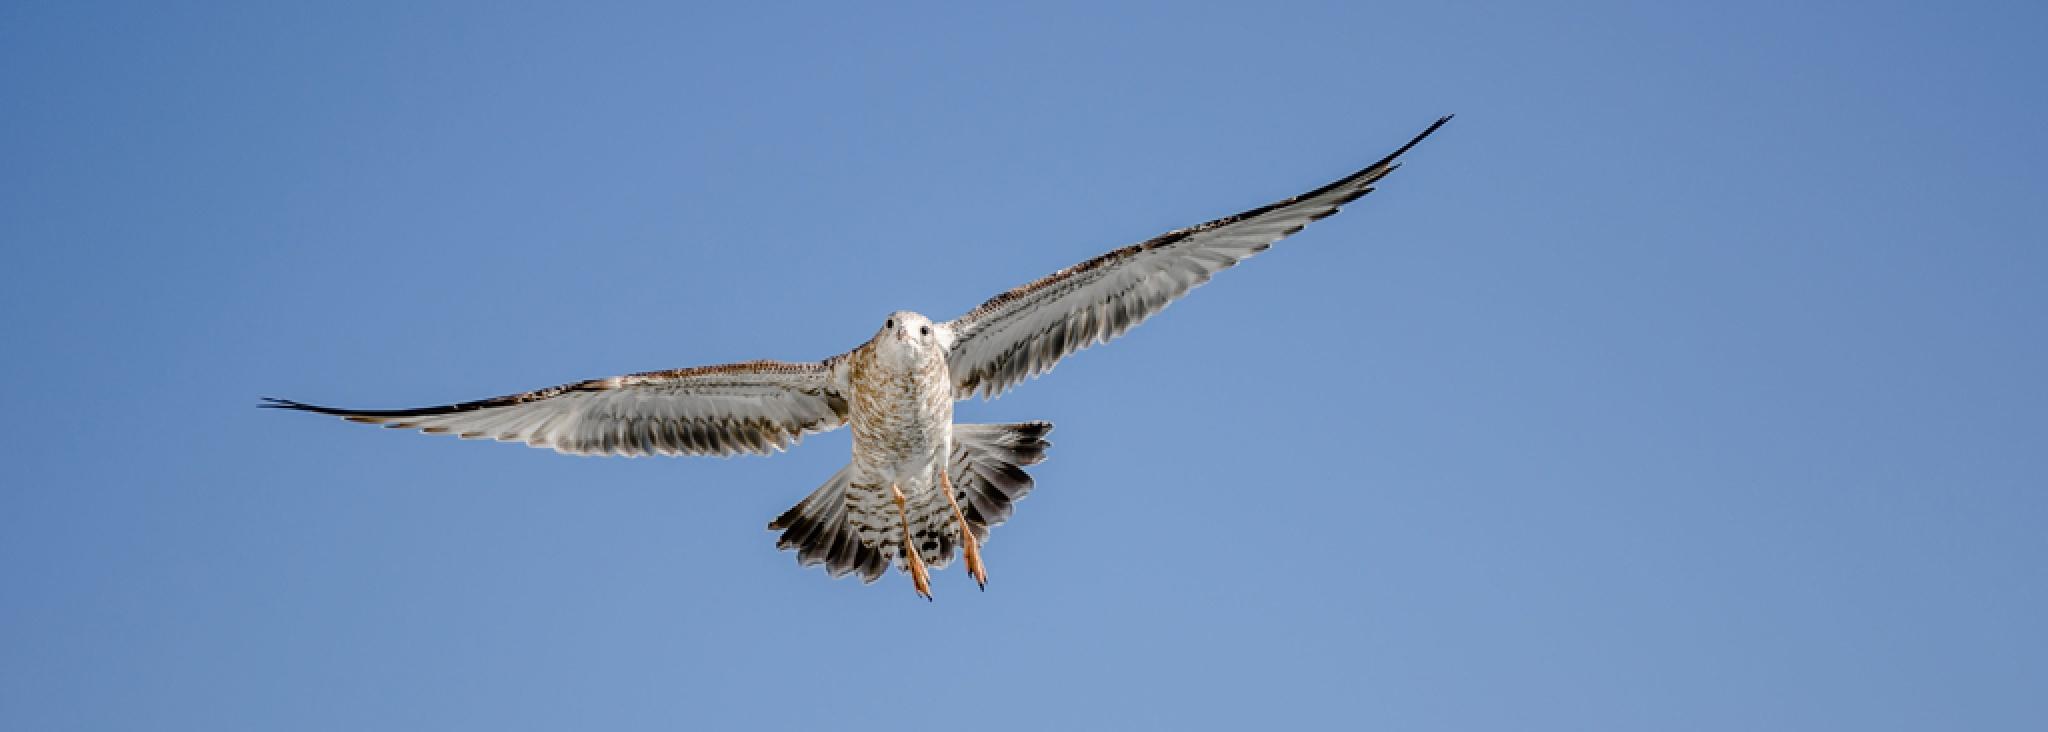 Seagull soar 2 by Captainmorgan1301